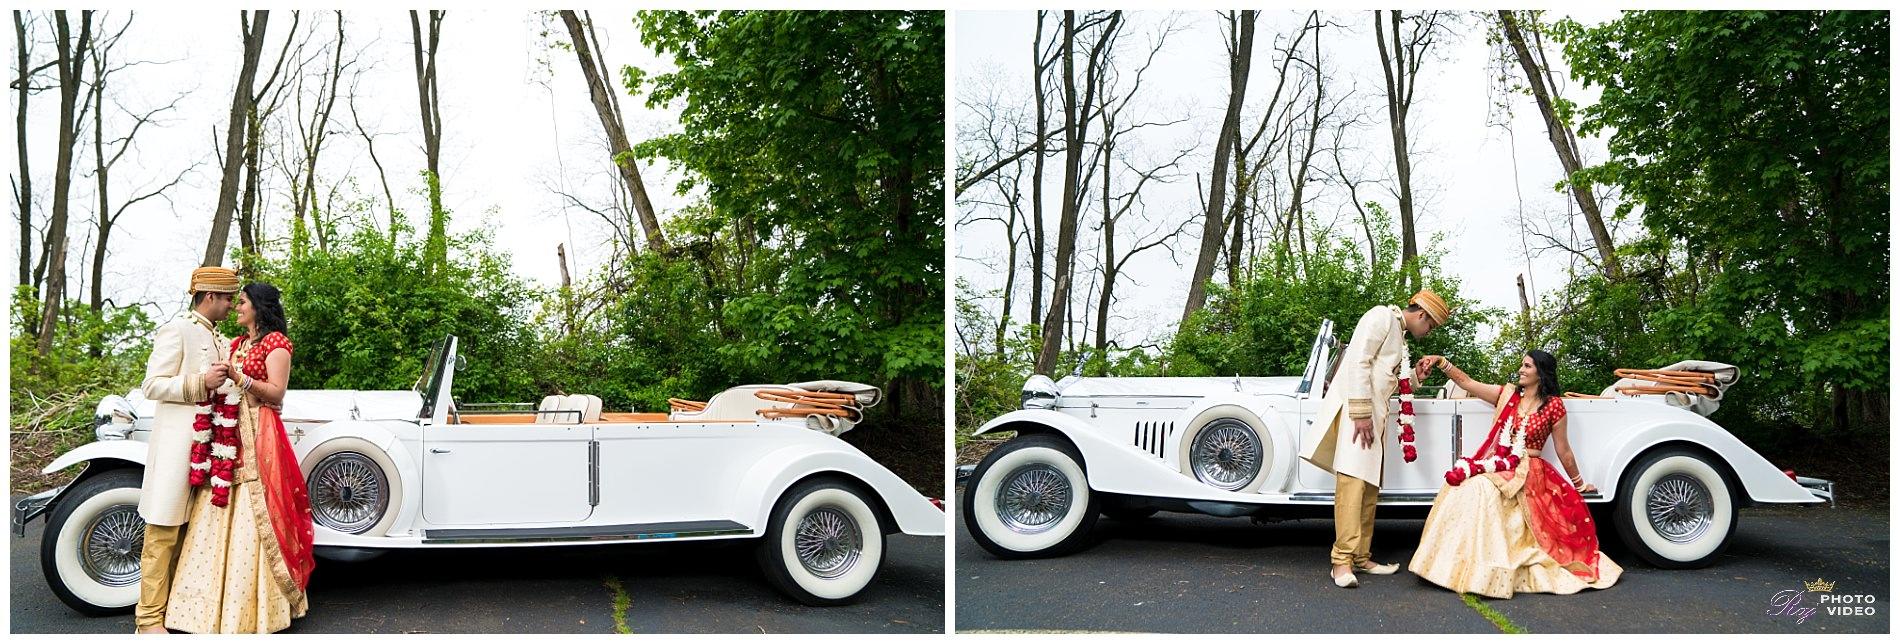 Martinsville-Gardens-NJ-Indian-Wedding-Ruchi-Vishal-39.jpg